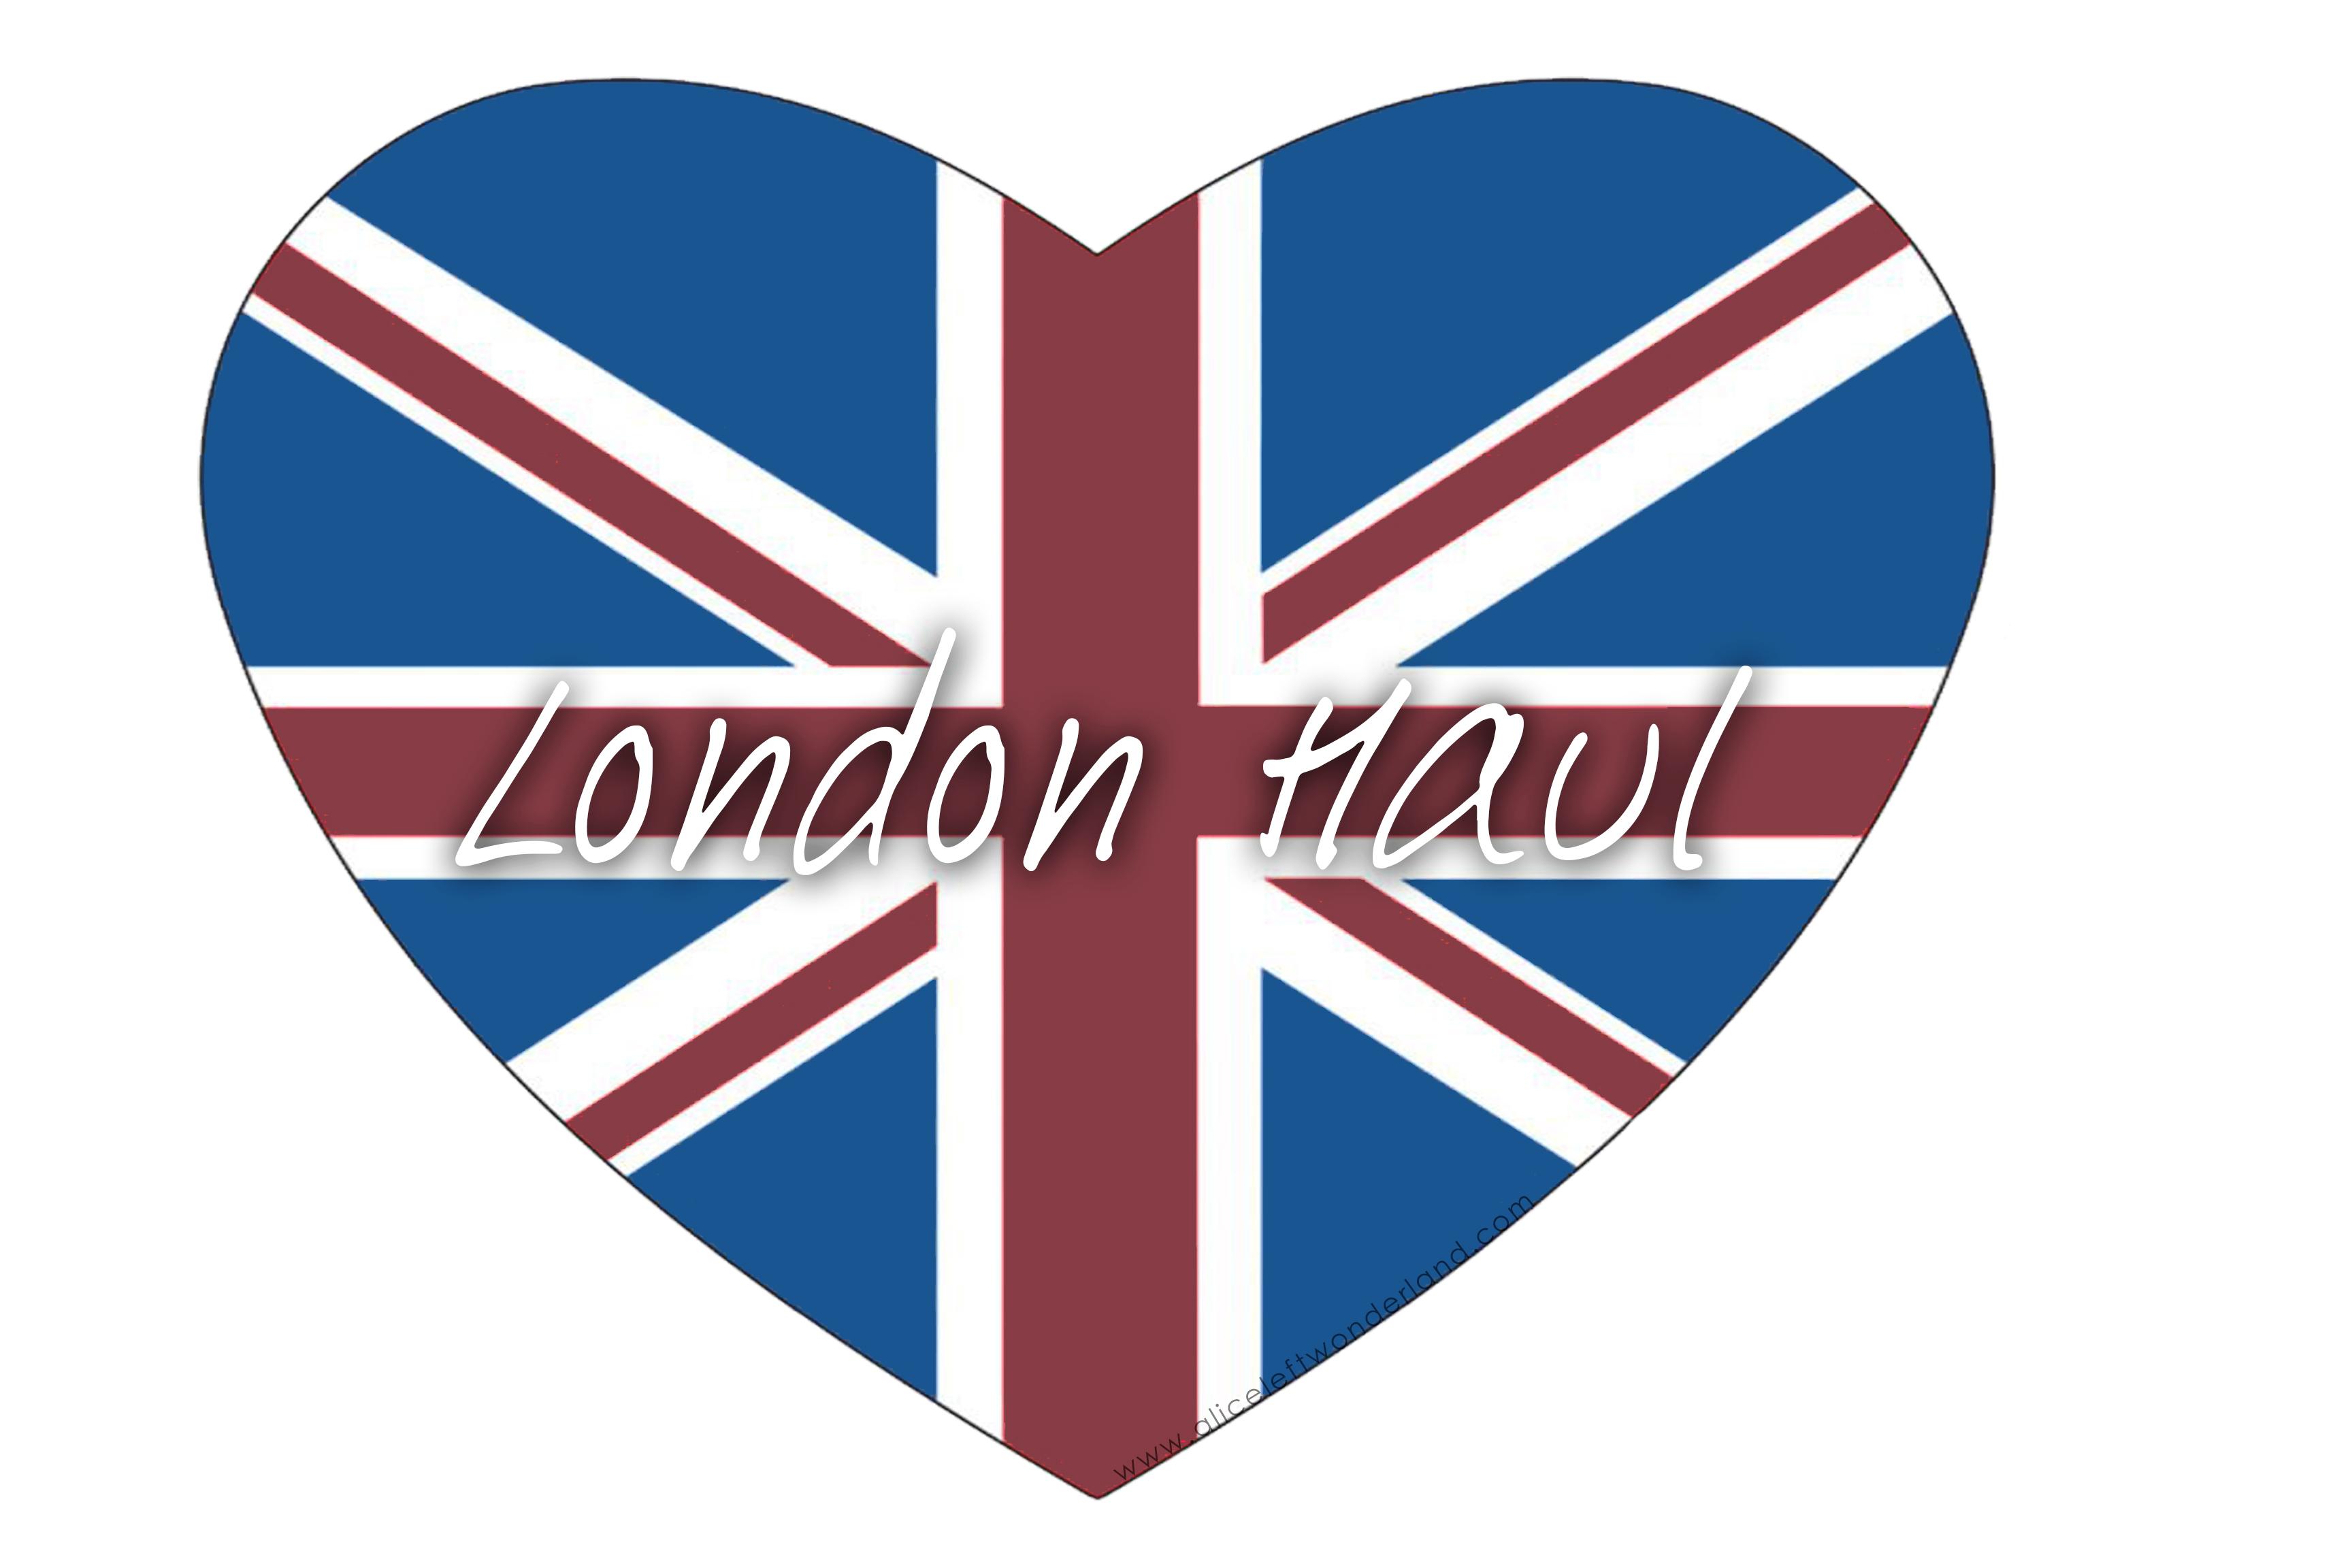 London-Haul